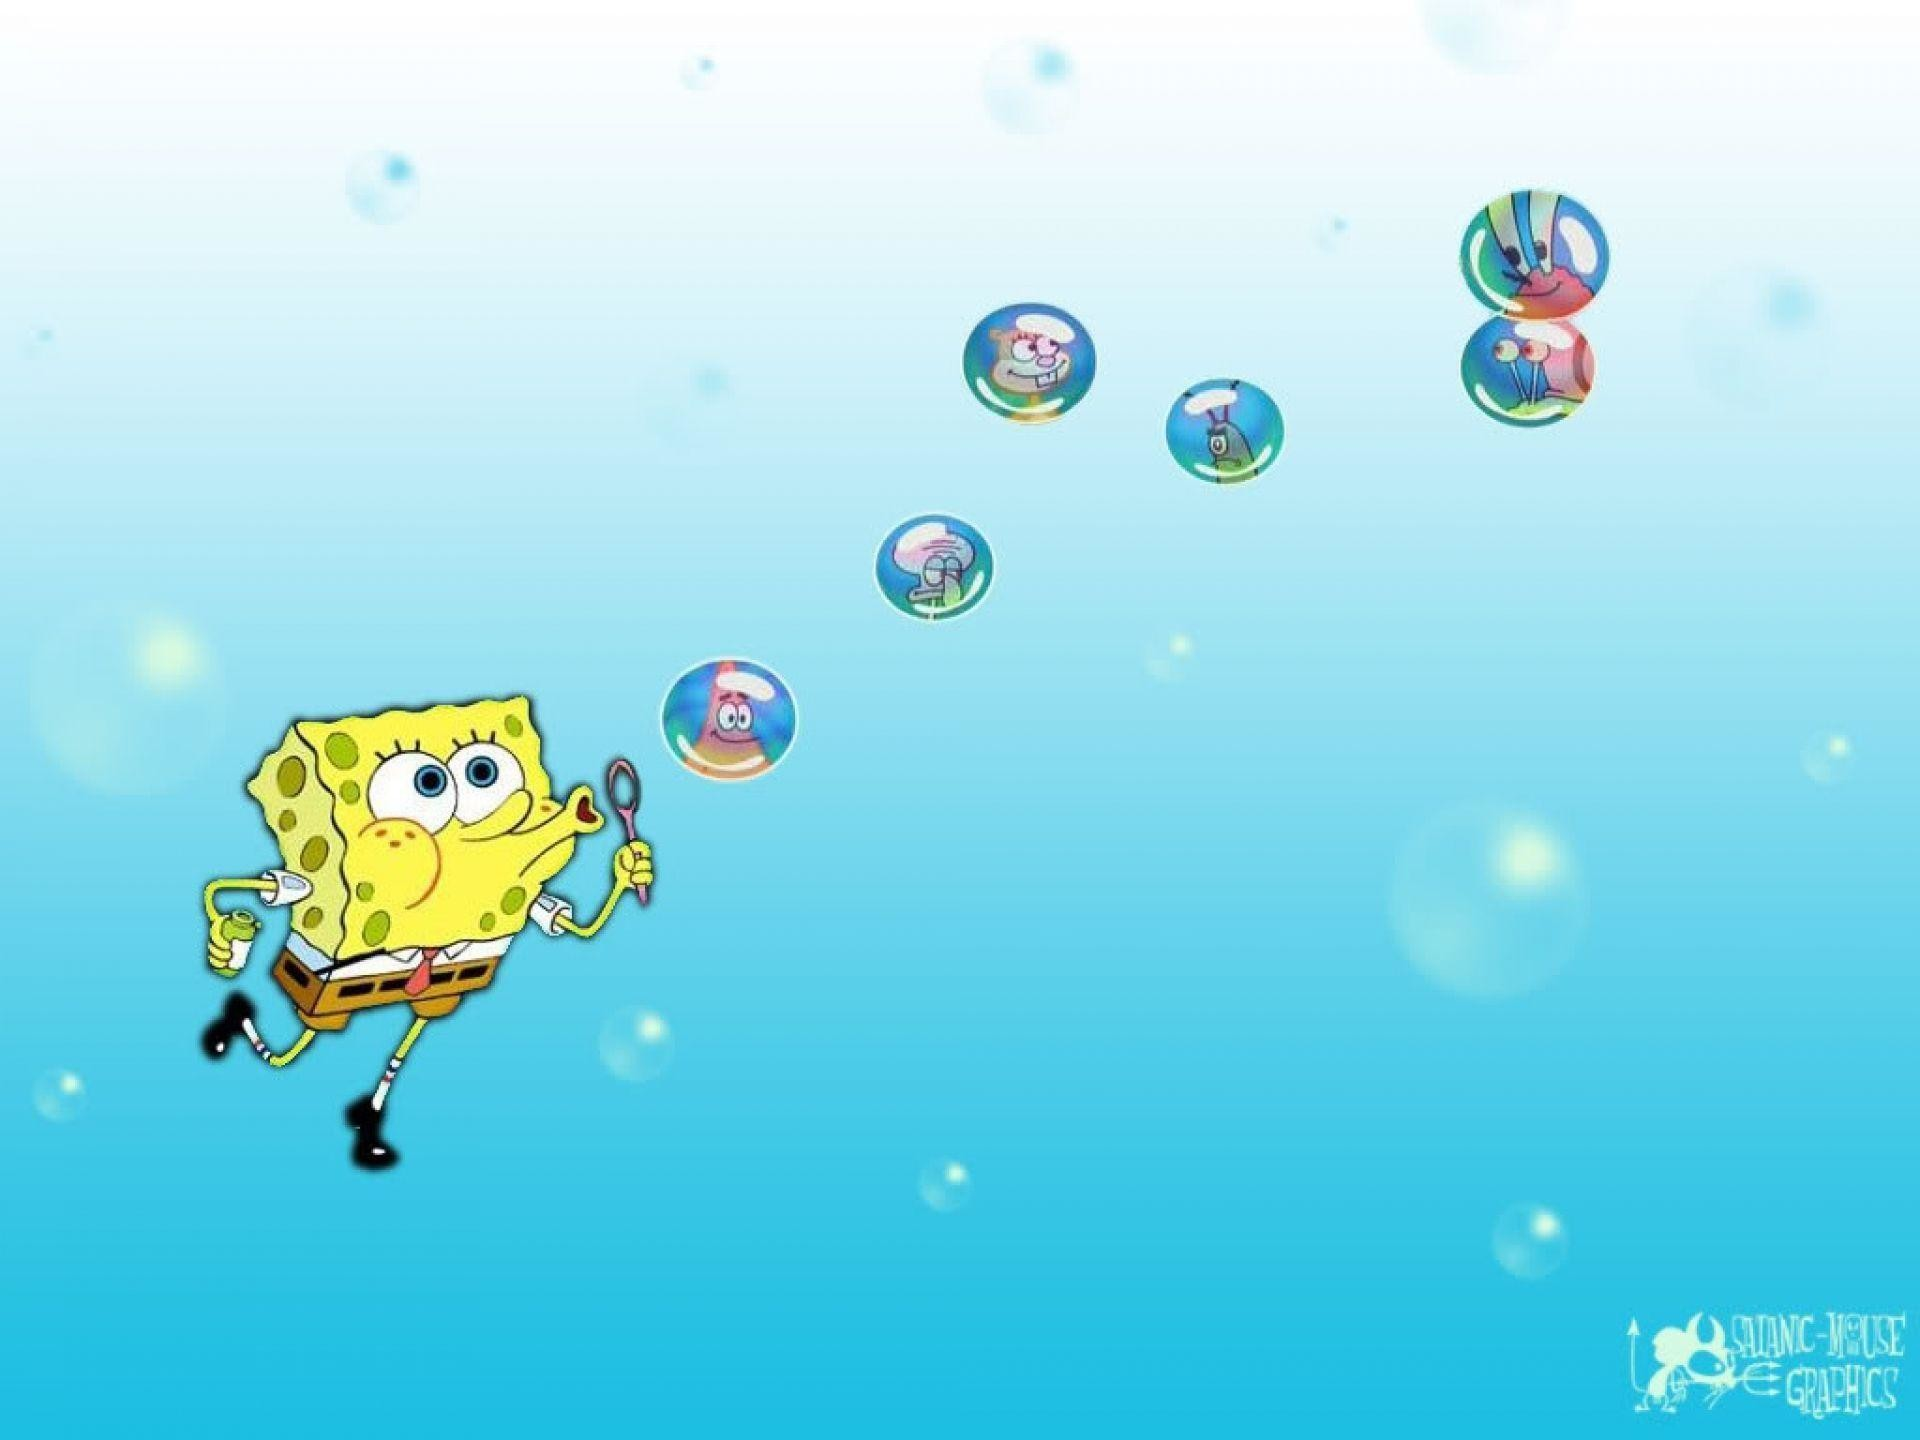 Spongebob Background Spongebob Background Scene Spongebob Background